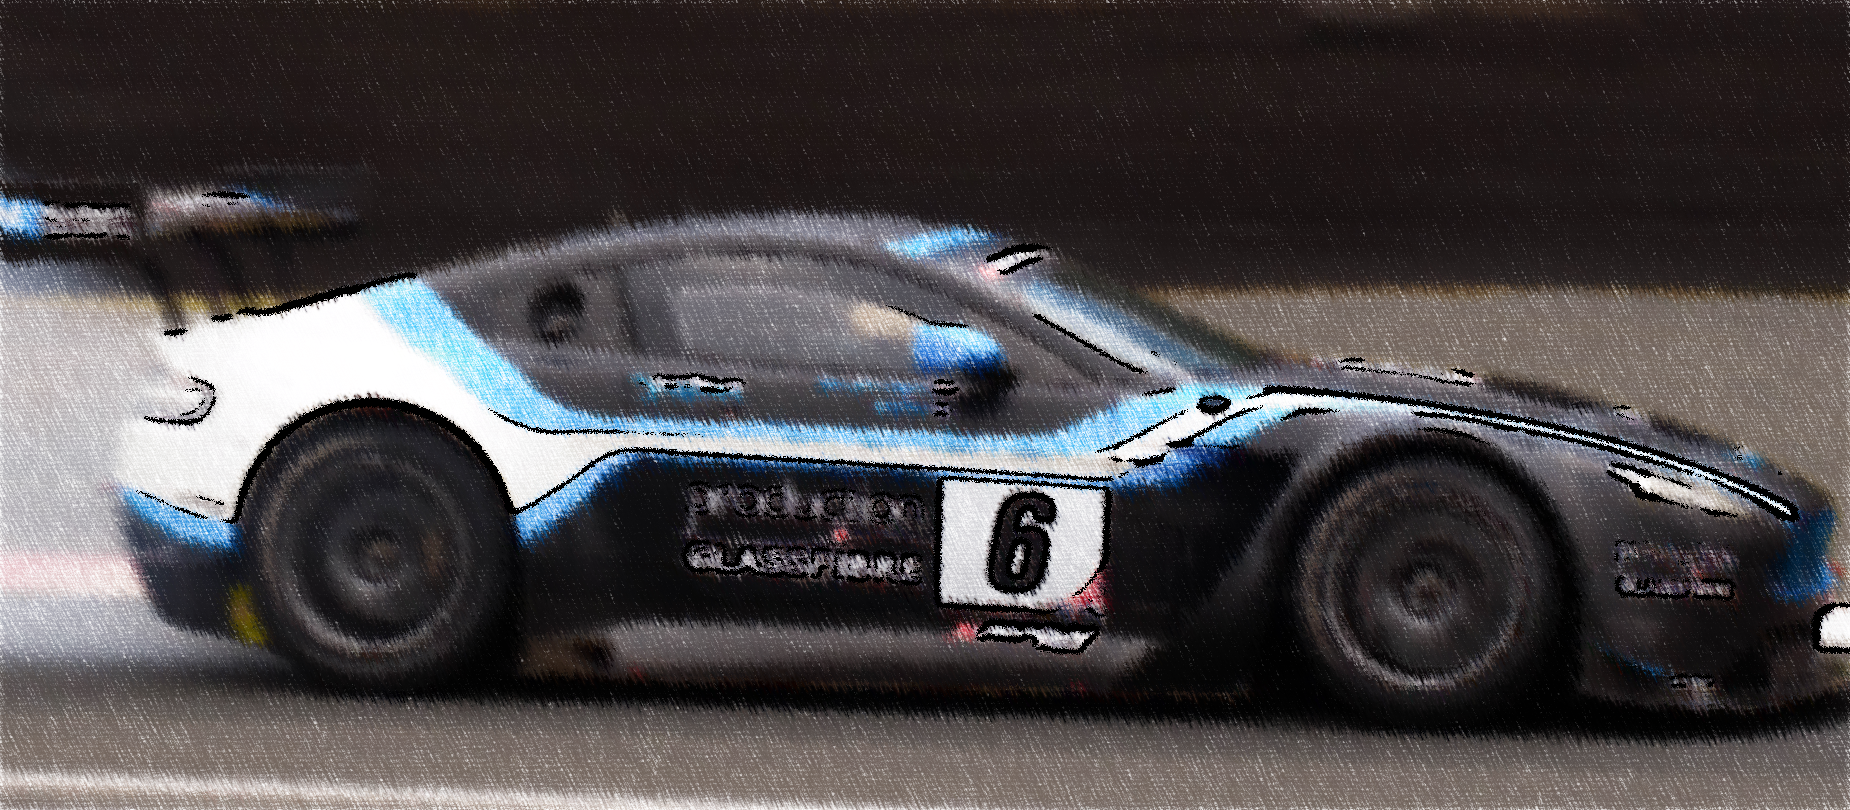 Motorsportsensoren